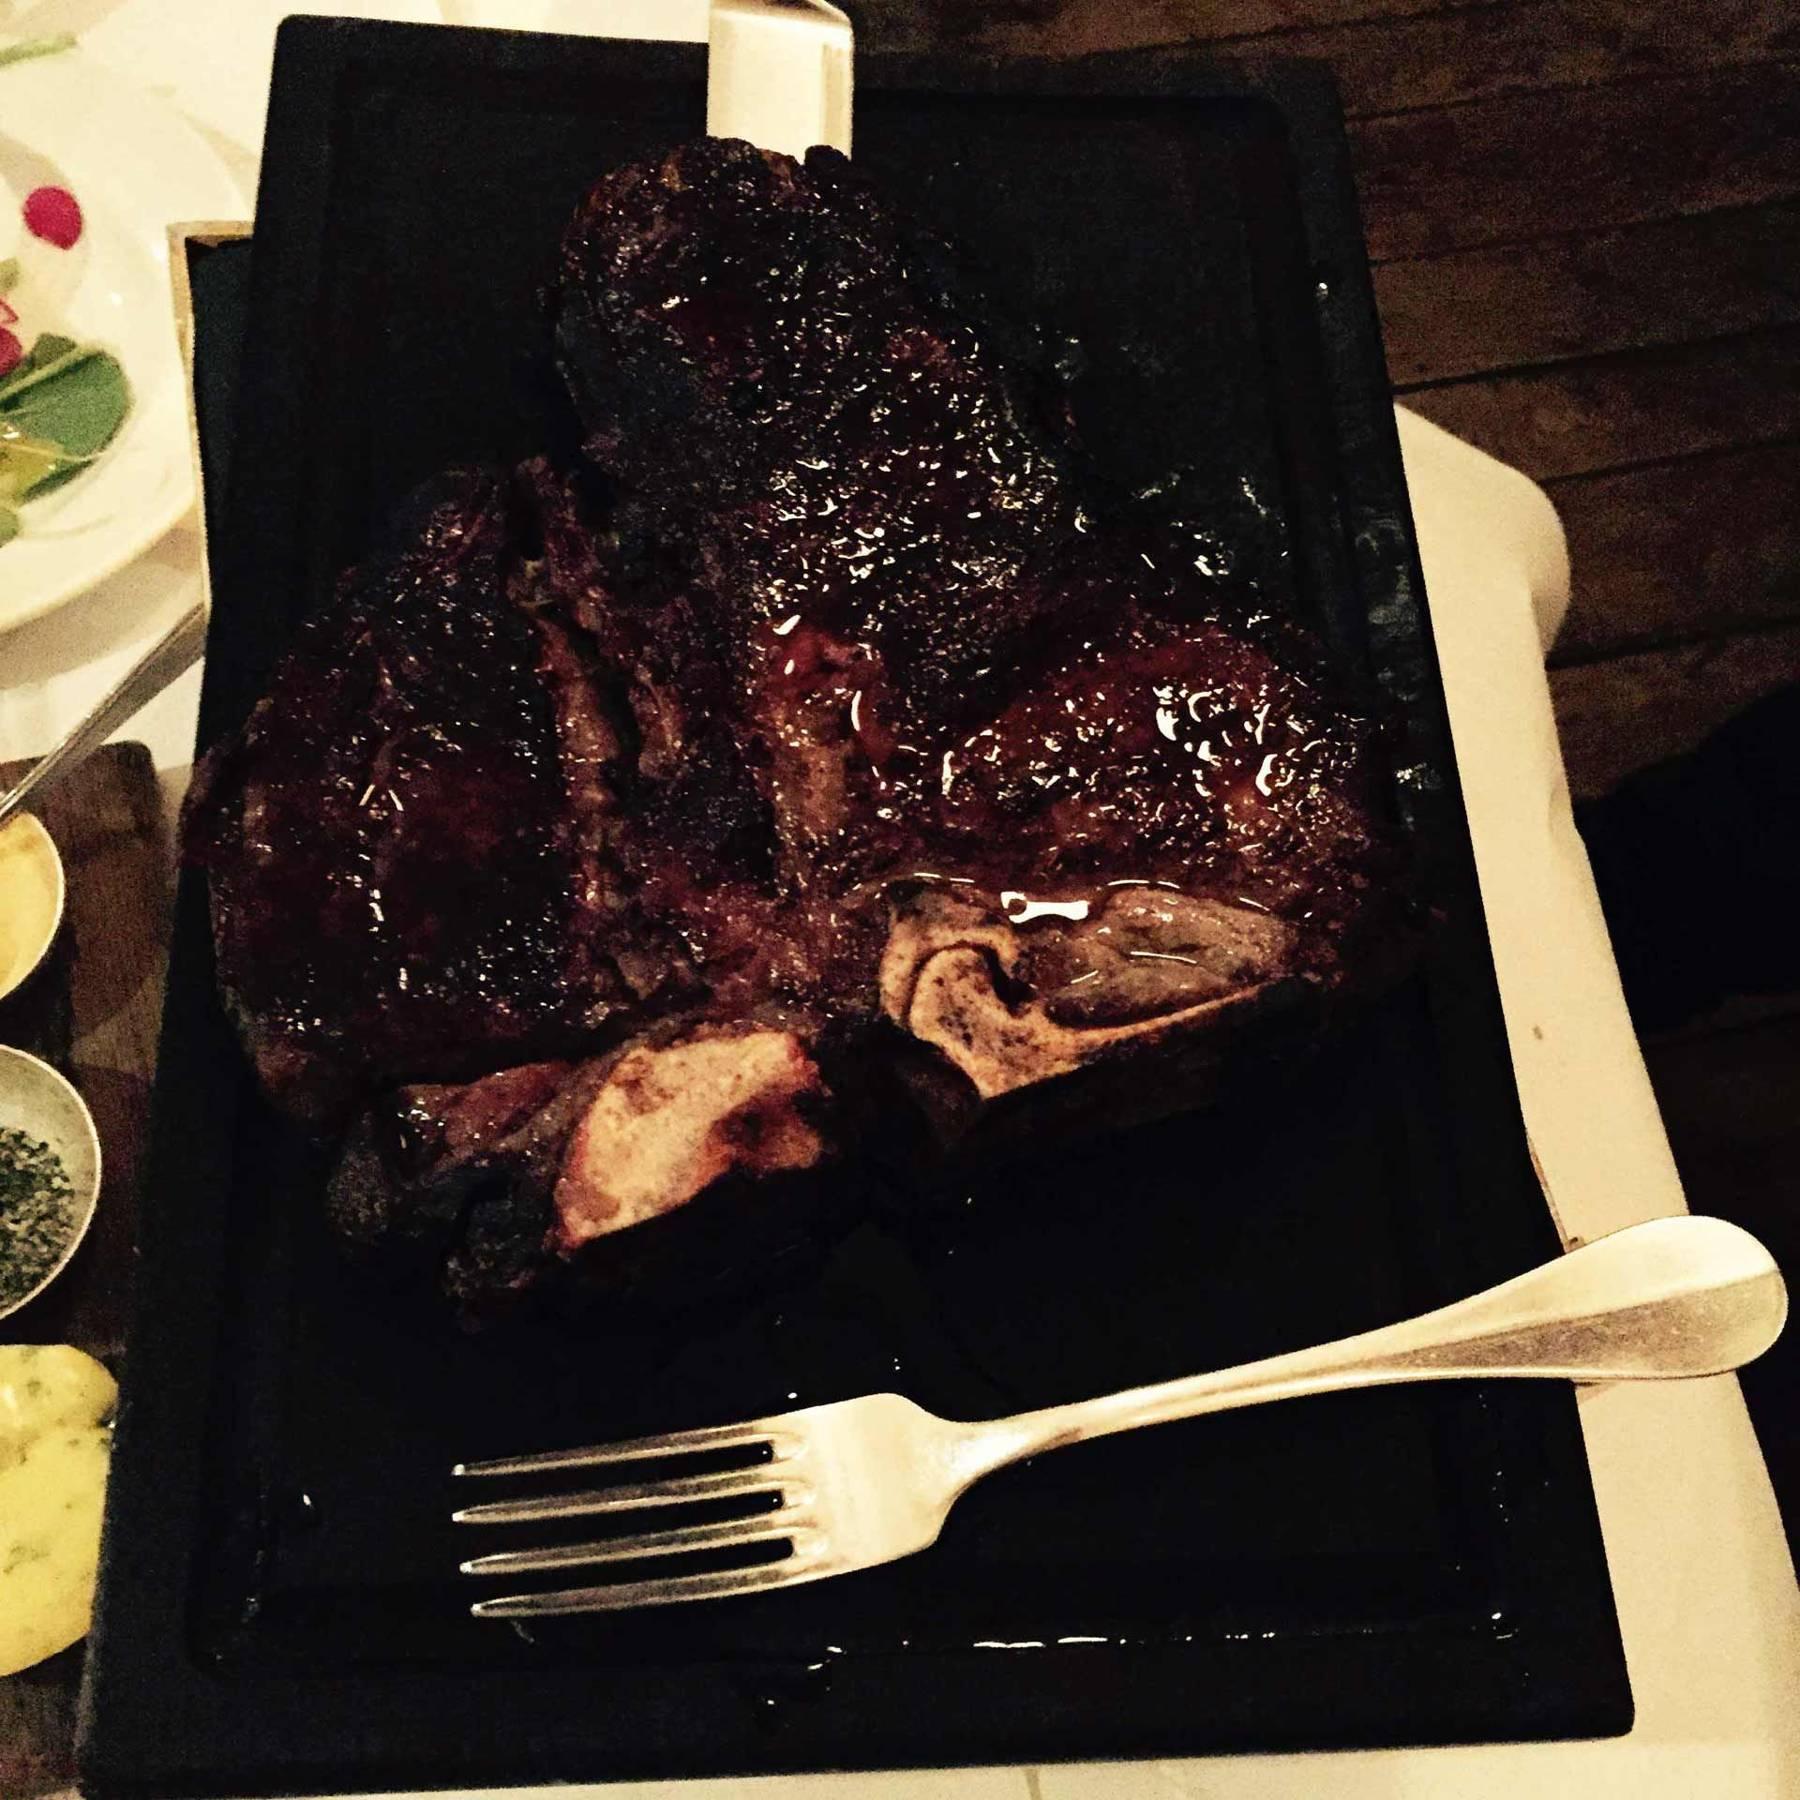 c15585319ba1 London s best steak restaurants